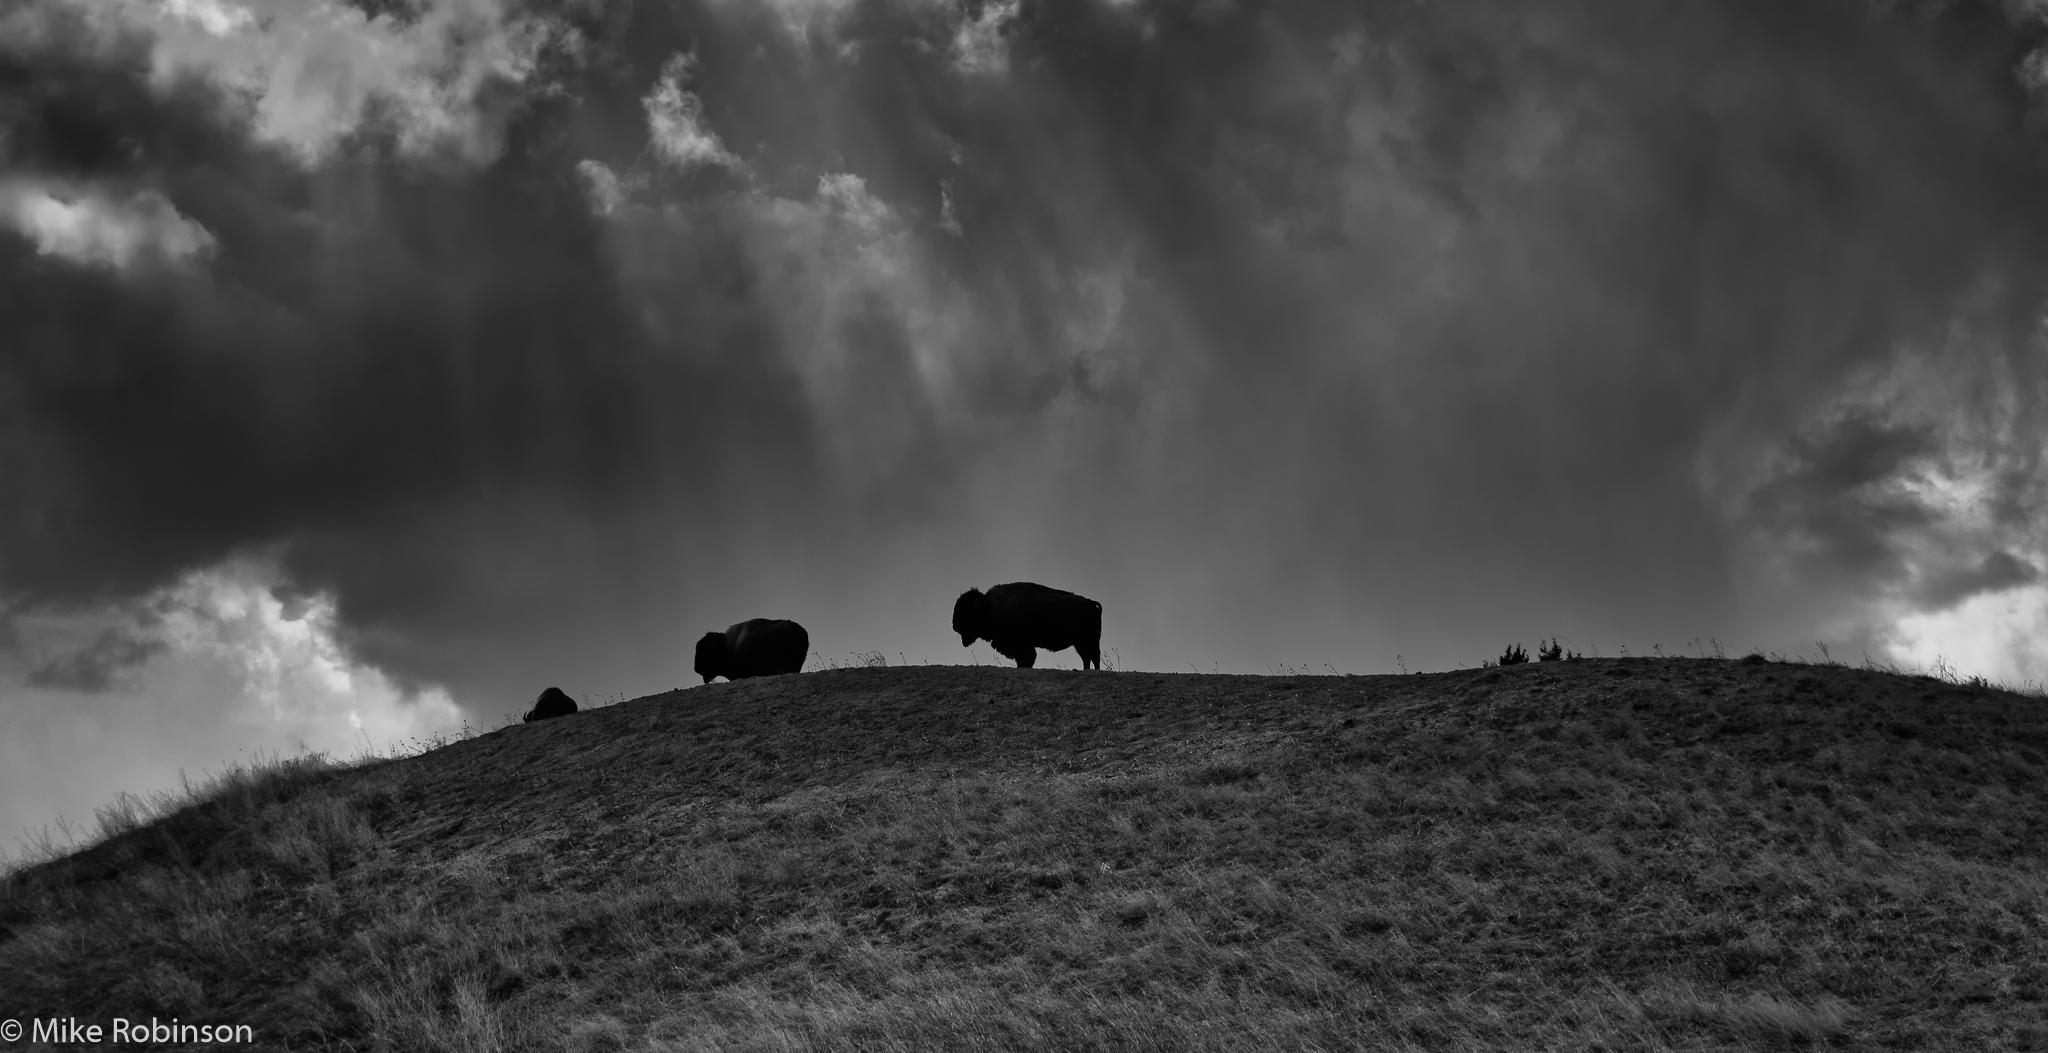 Badlands_Buffalo_Skyline_BW.jpg